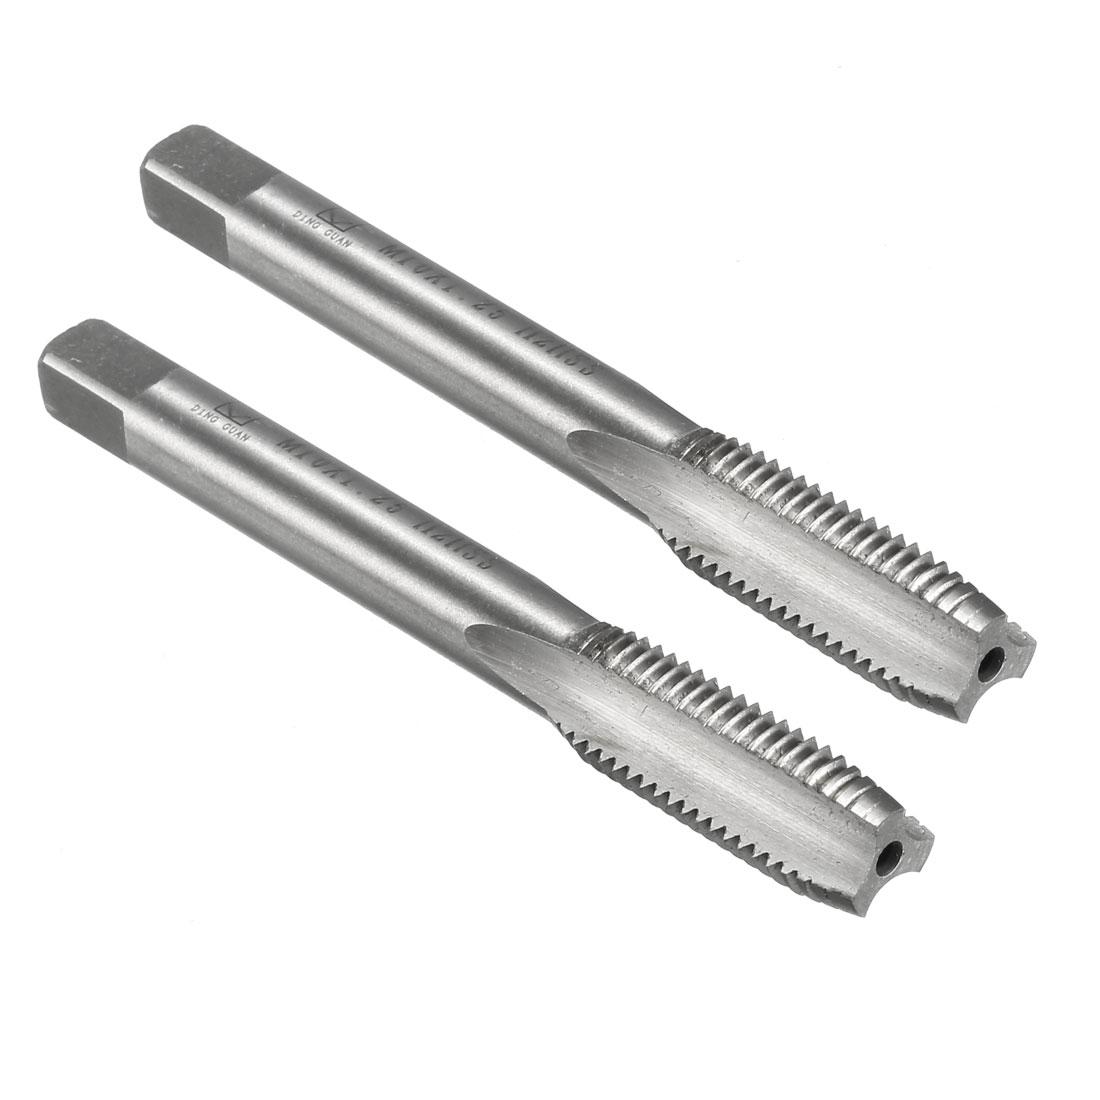 2pcs Metric Taps M10x1.25mm Pitch Thread Plug Tap HSS for Electric Drill - image 5 de 5